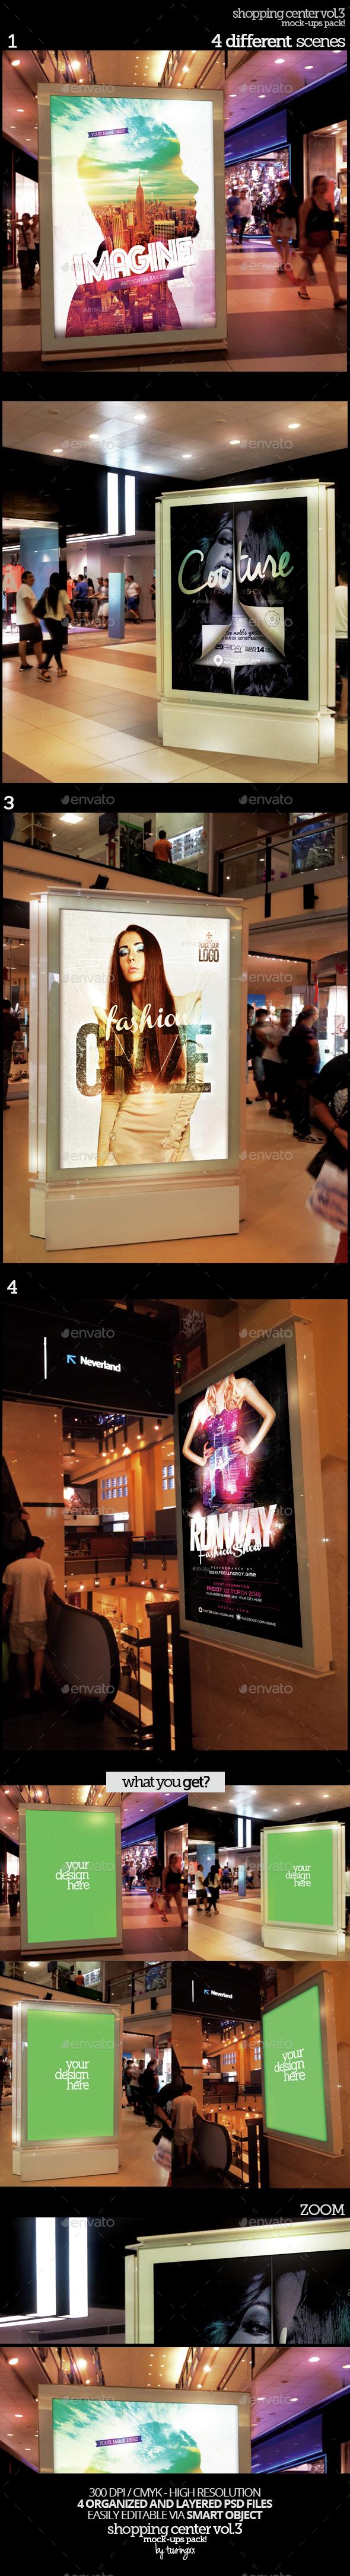 Shopping Center Vol.3 Mock-Ups Pack - Product Mock-Ups Graphics